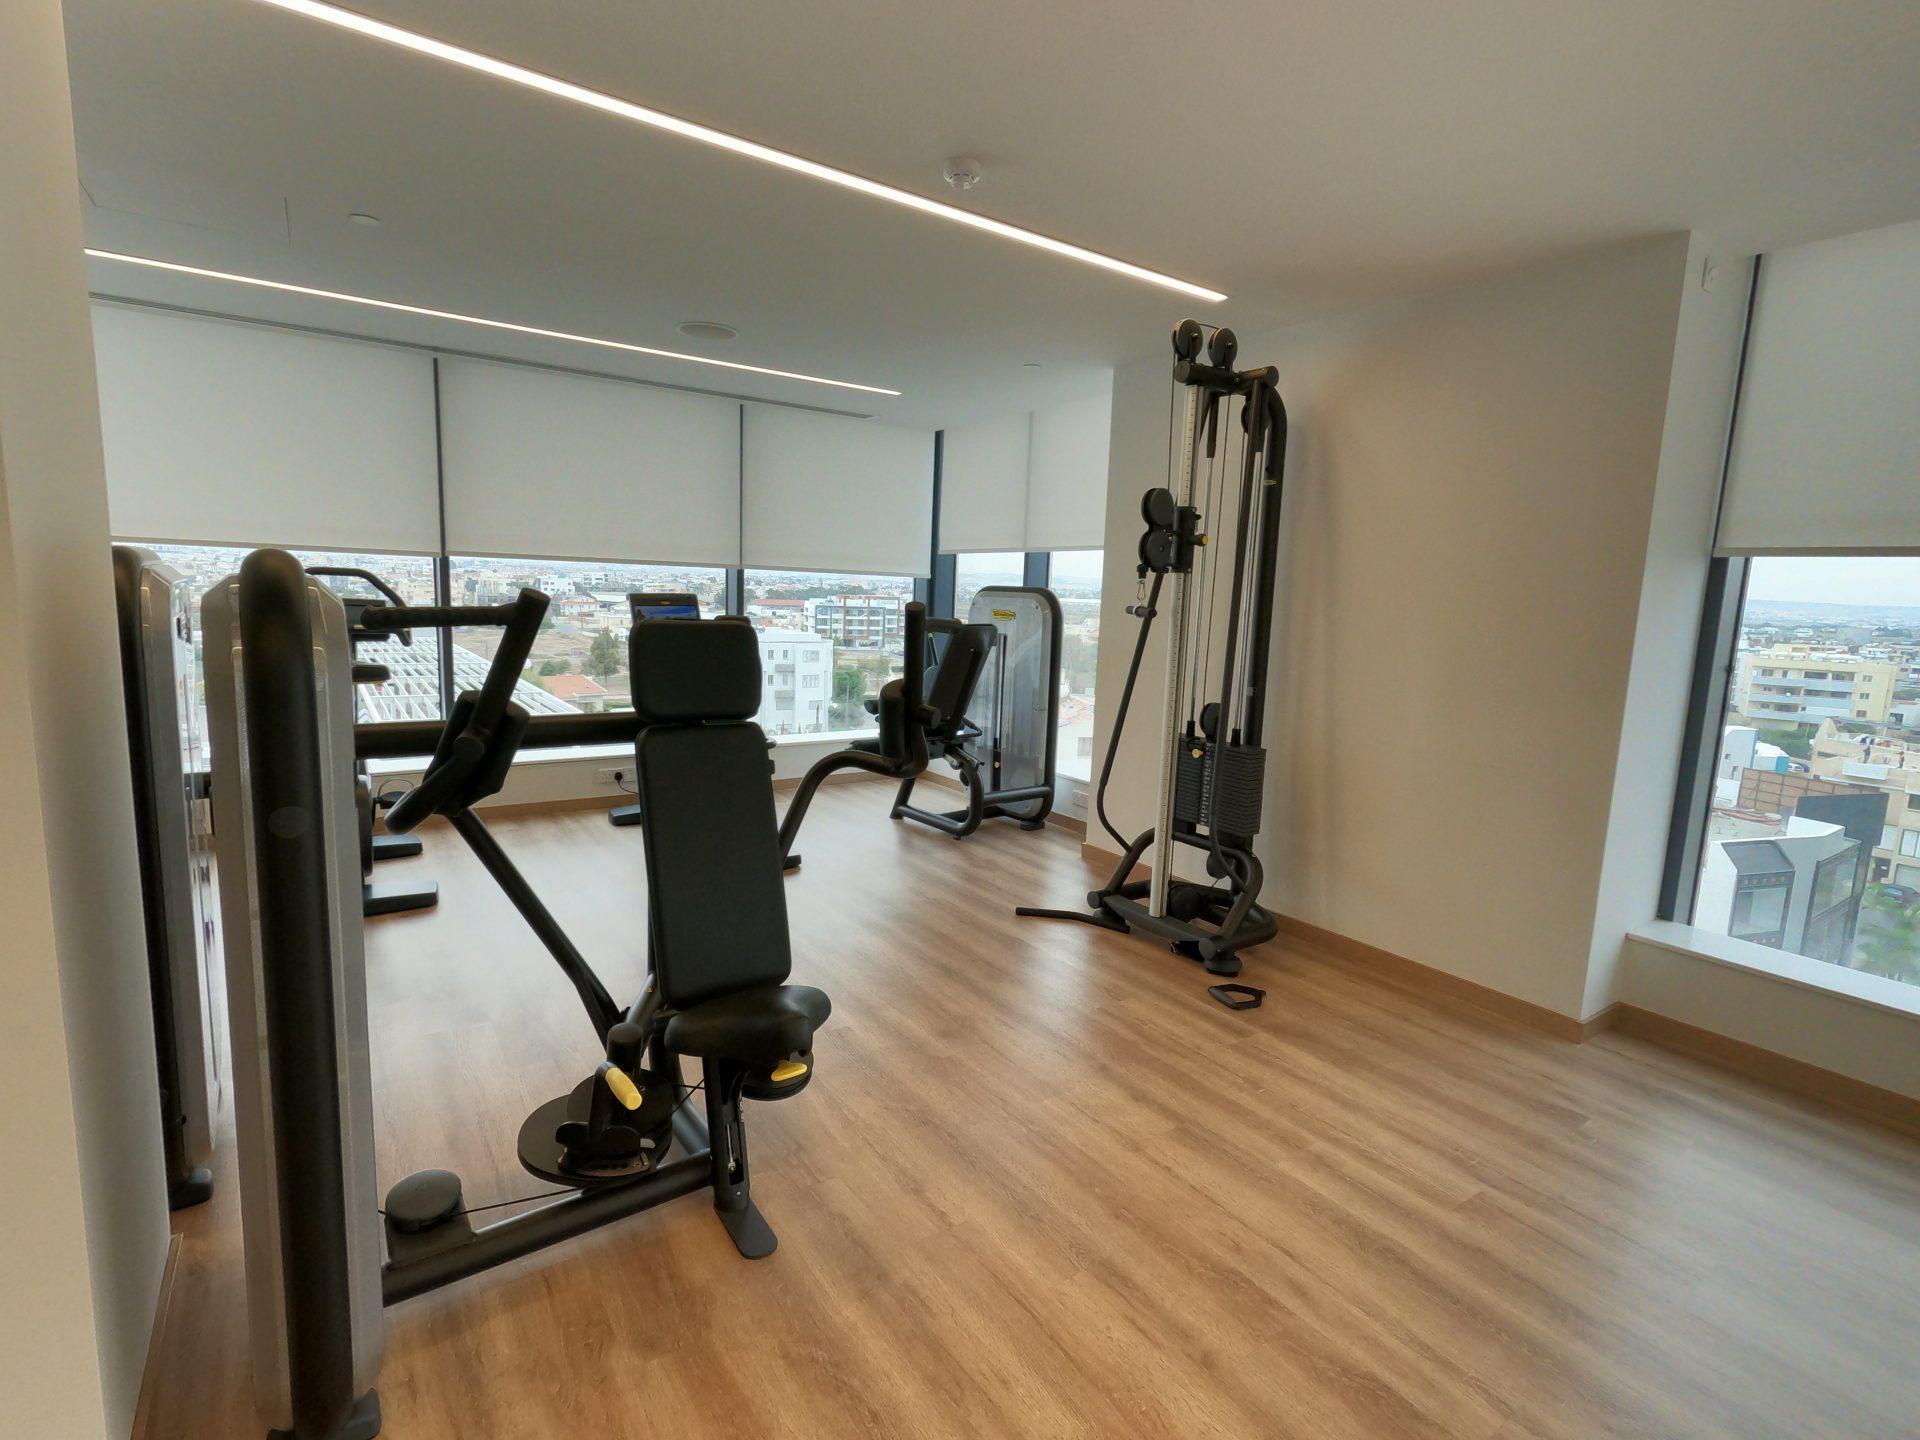 Spa, Gym & Wellness Center at Radisson Blu Hotel, Larnaca, Cyprus